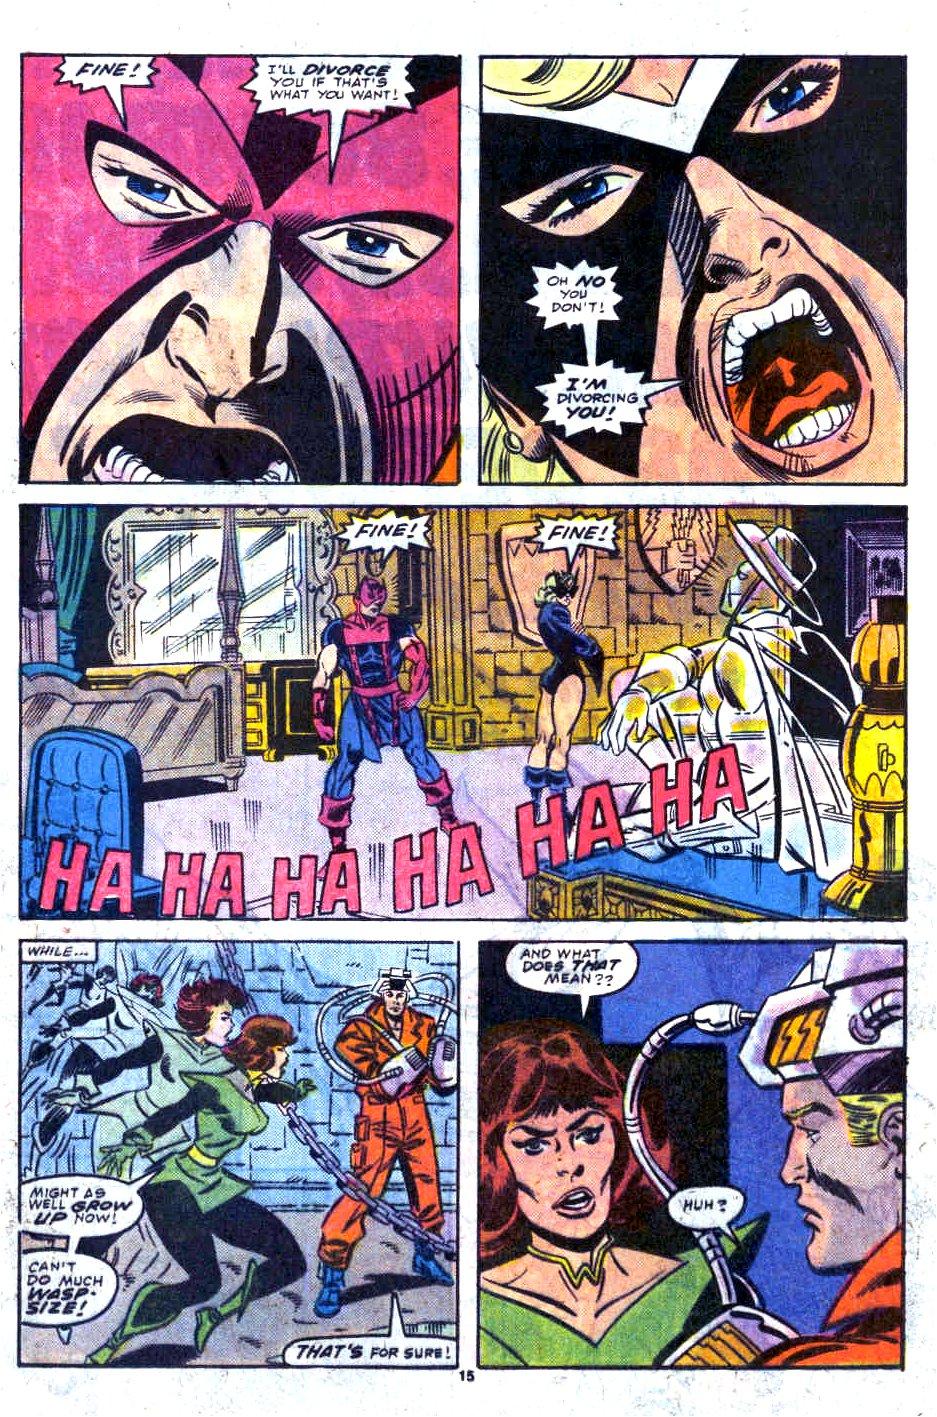 Hawkeye divorce